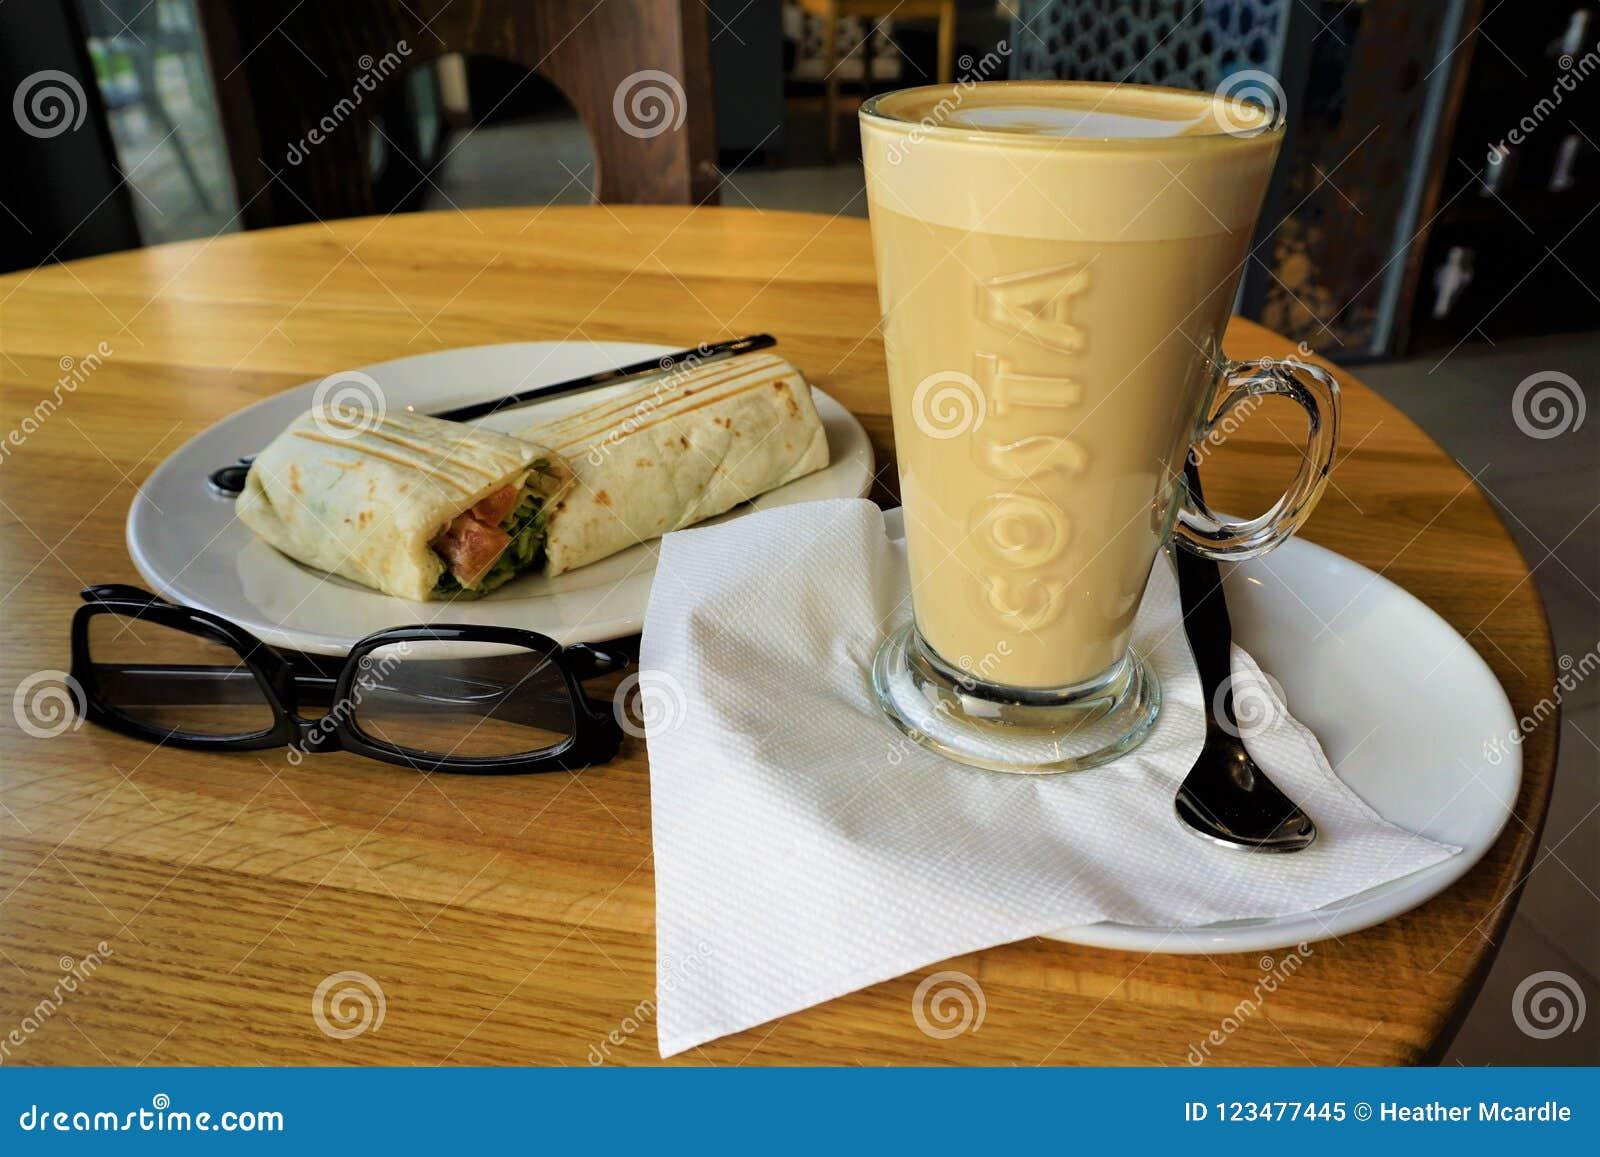 Costa brand American coffee latte, breakfast sandwich and reading glasses